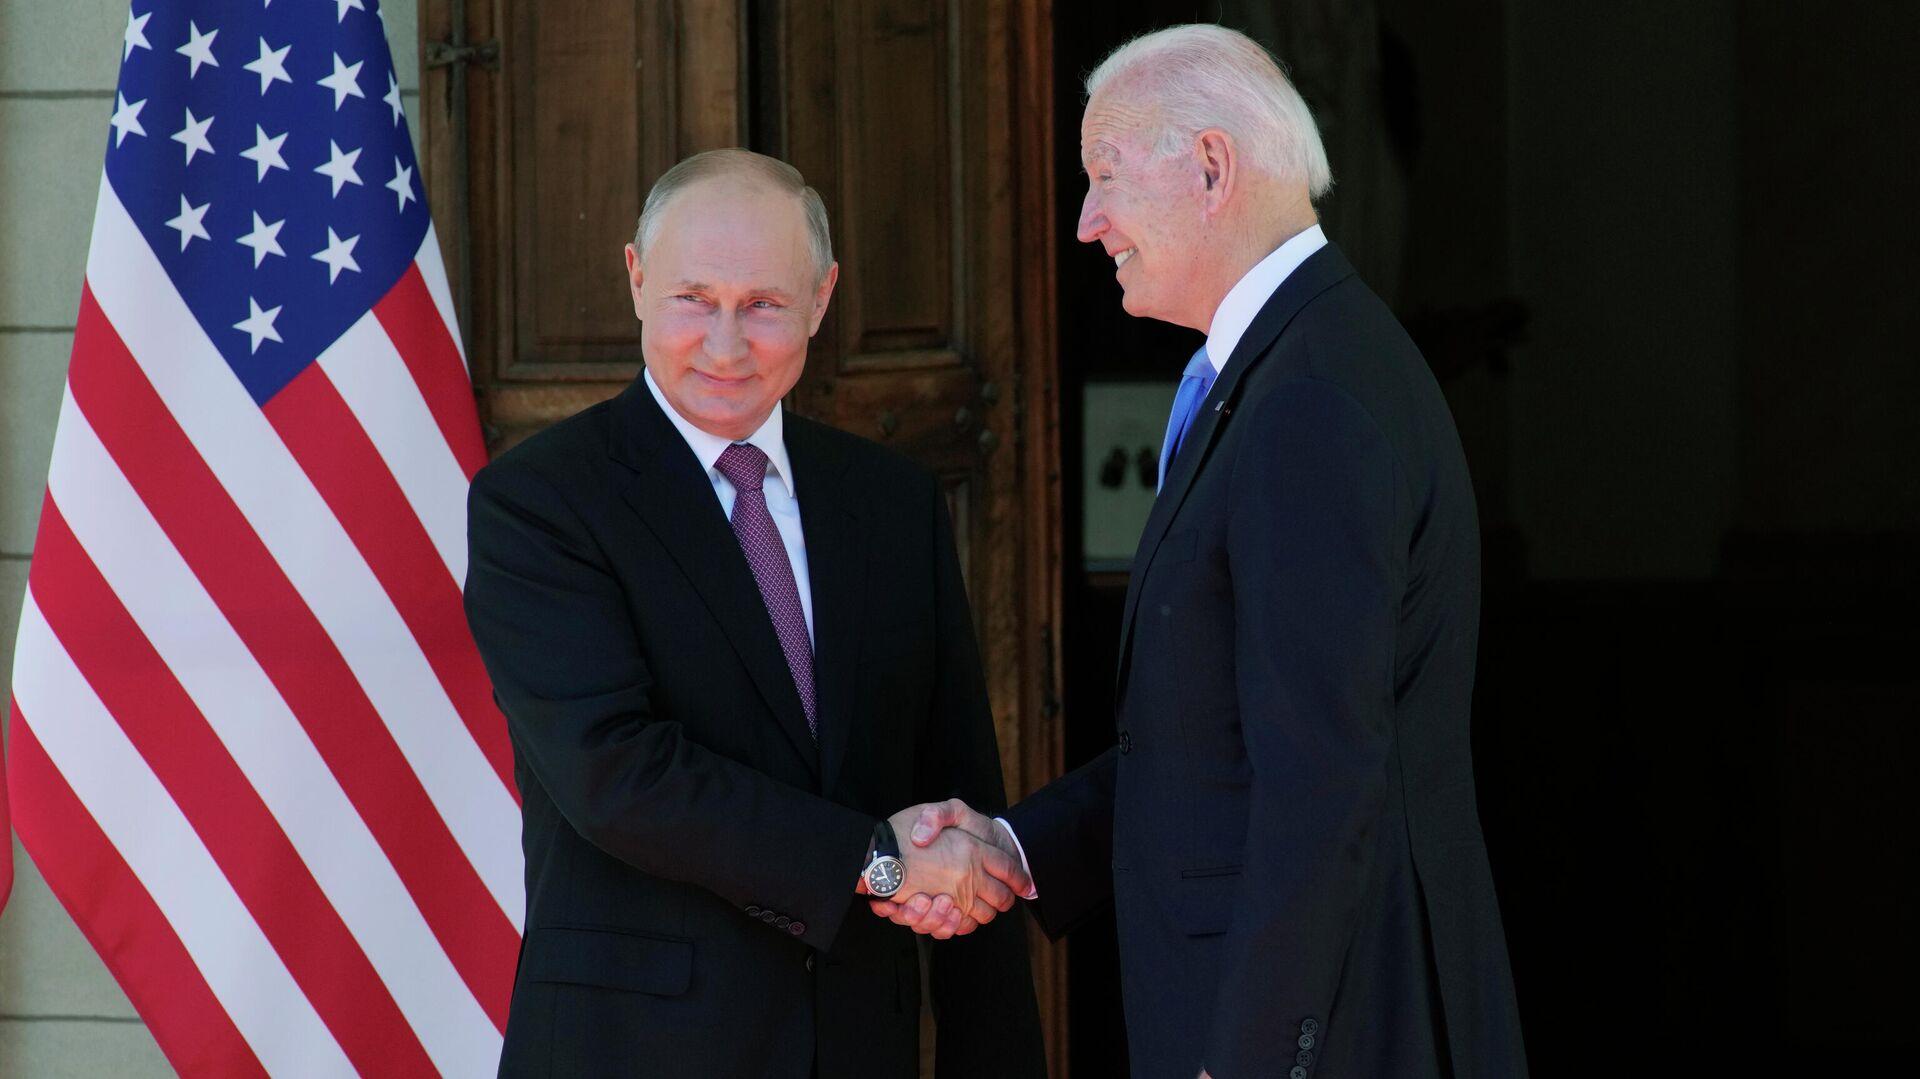 Рукопожатие президента России Владимира Путина и президента США Джо Байдена - Sputnik Таджикистан, 1920, 21.06.2021